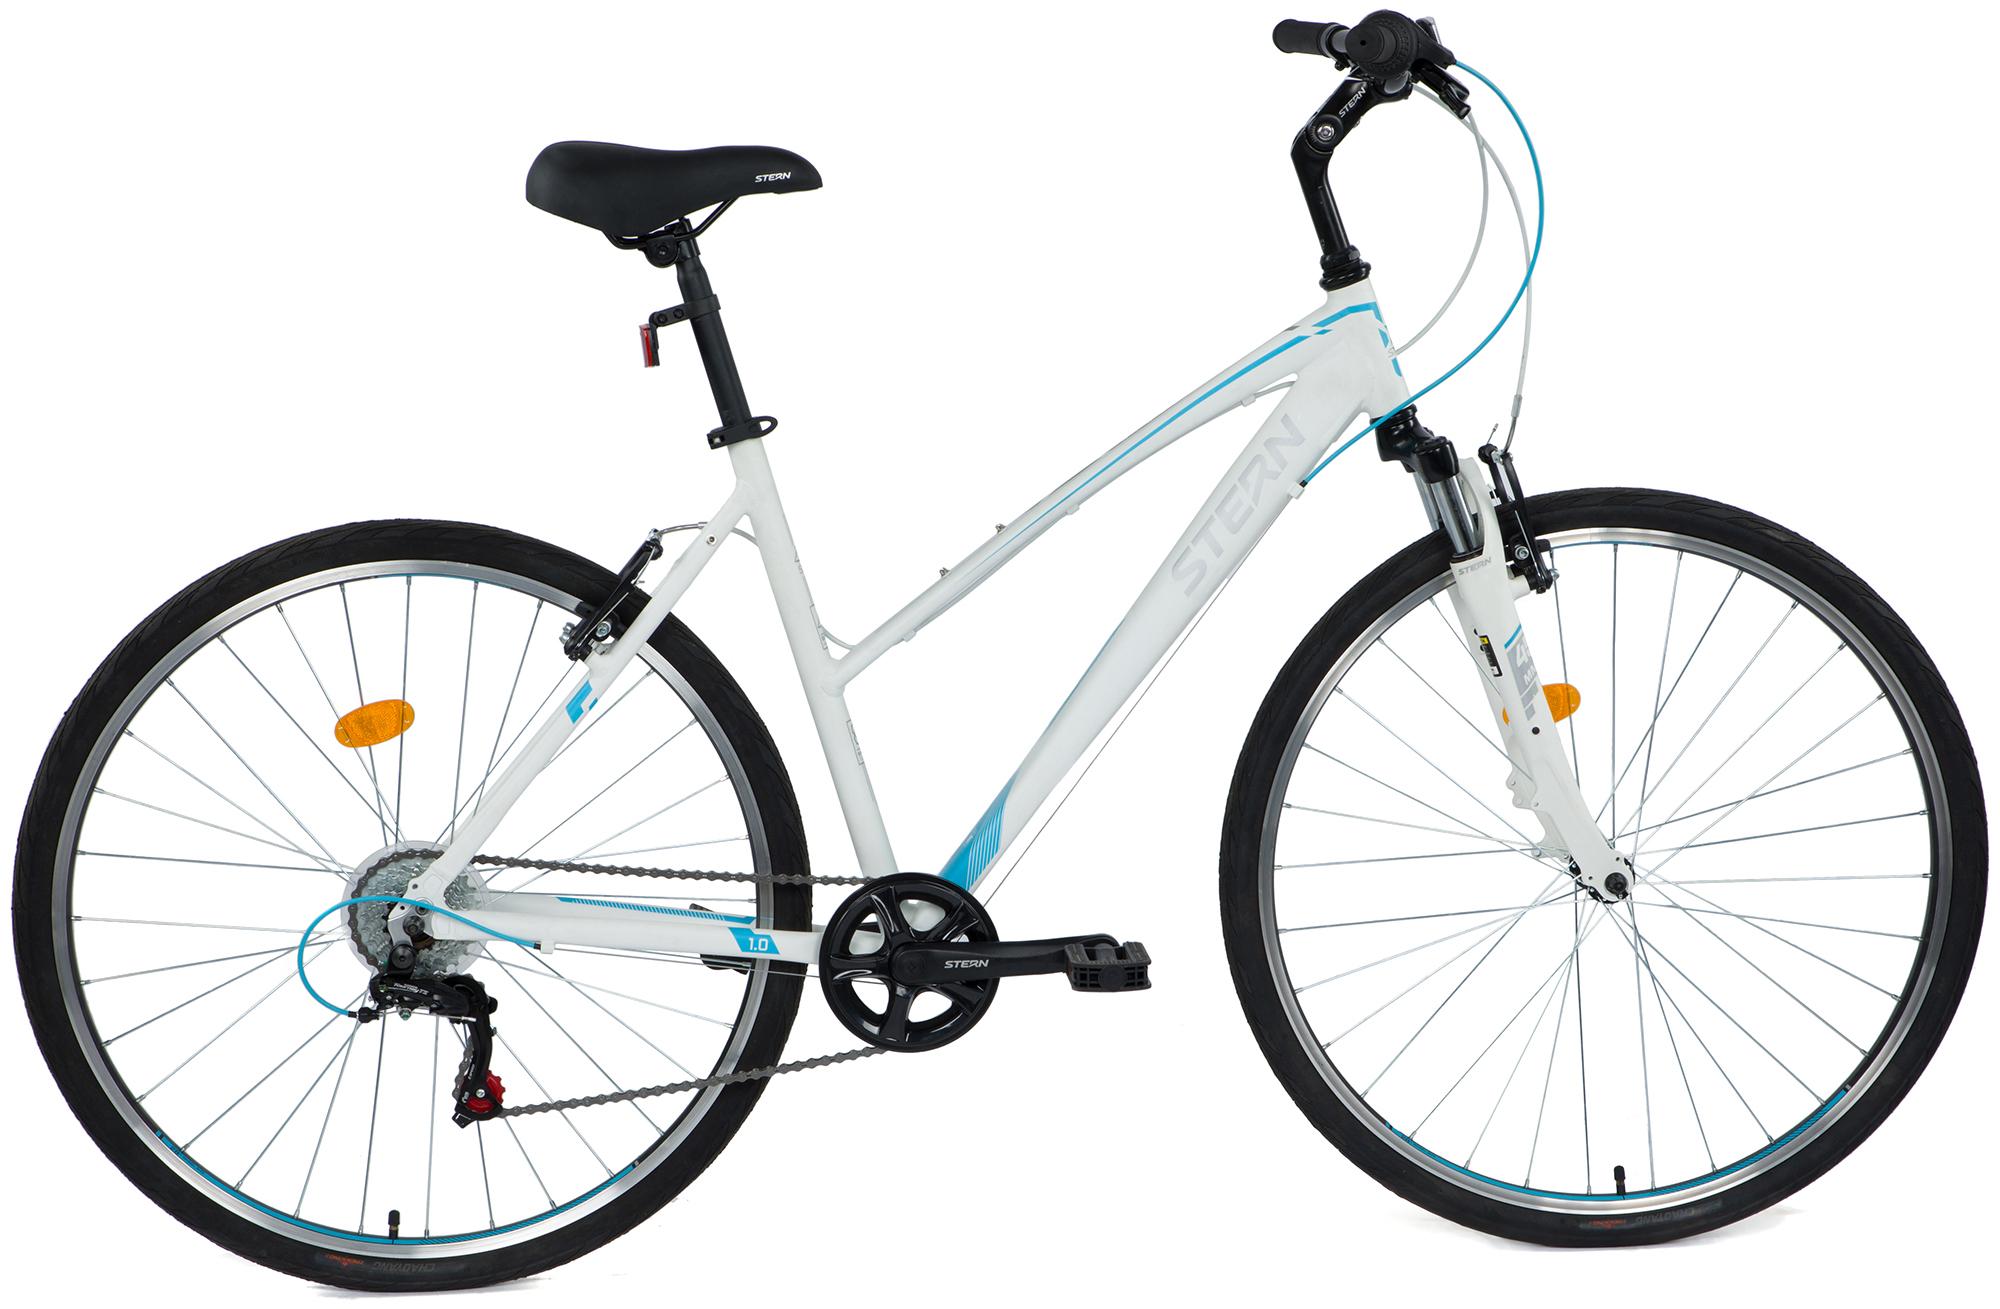 Stern Велосипед городской женский Stern Urban 1.0 Lady 28 велосипед ghost square urban 2 2016